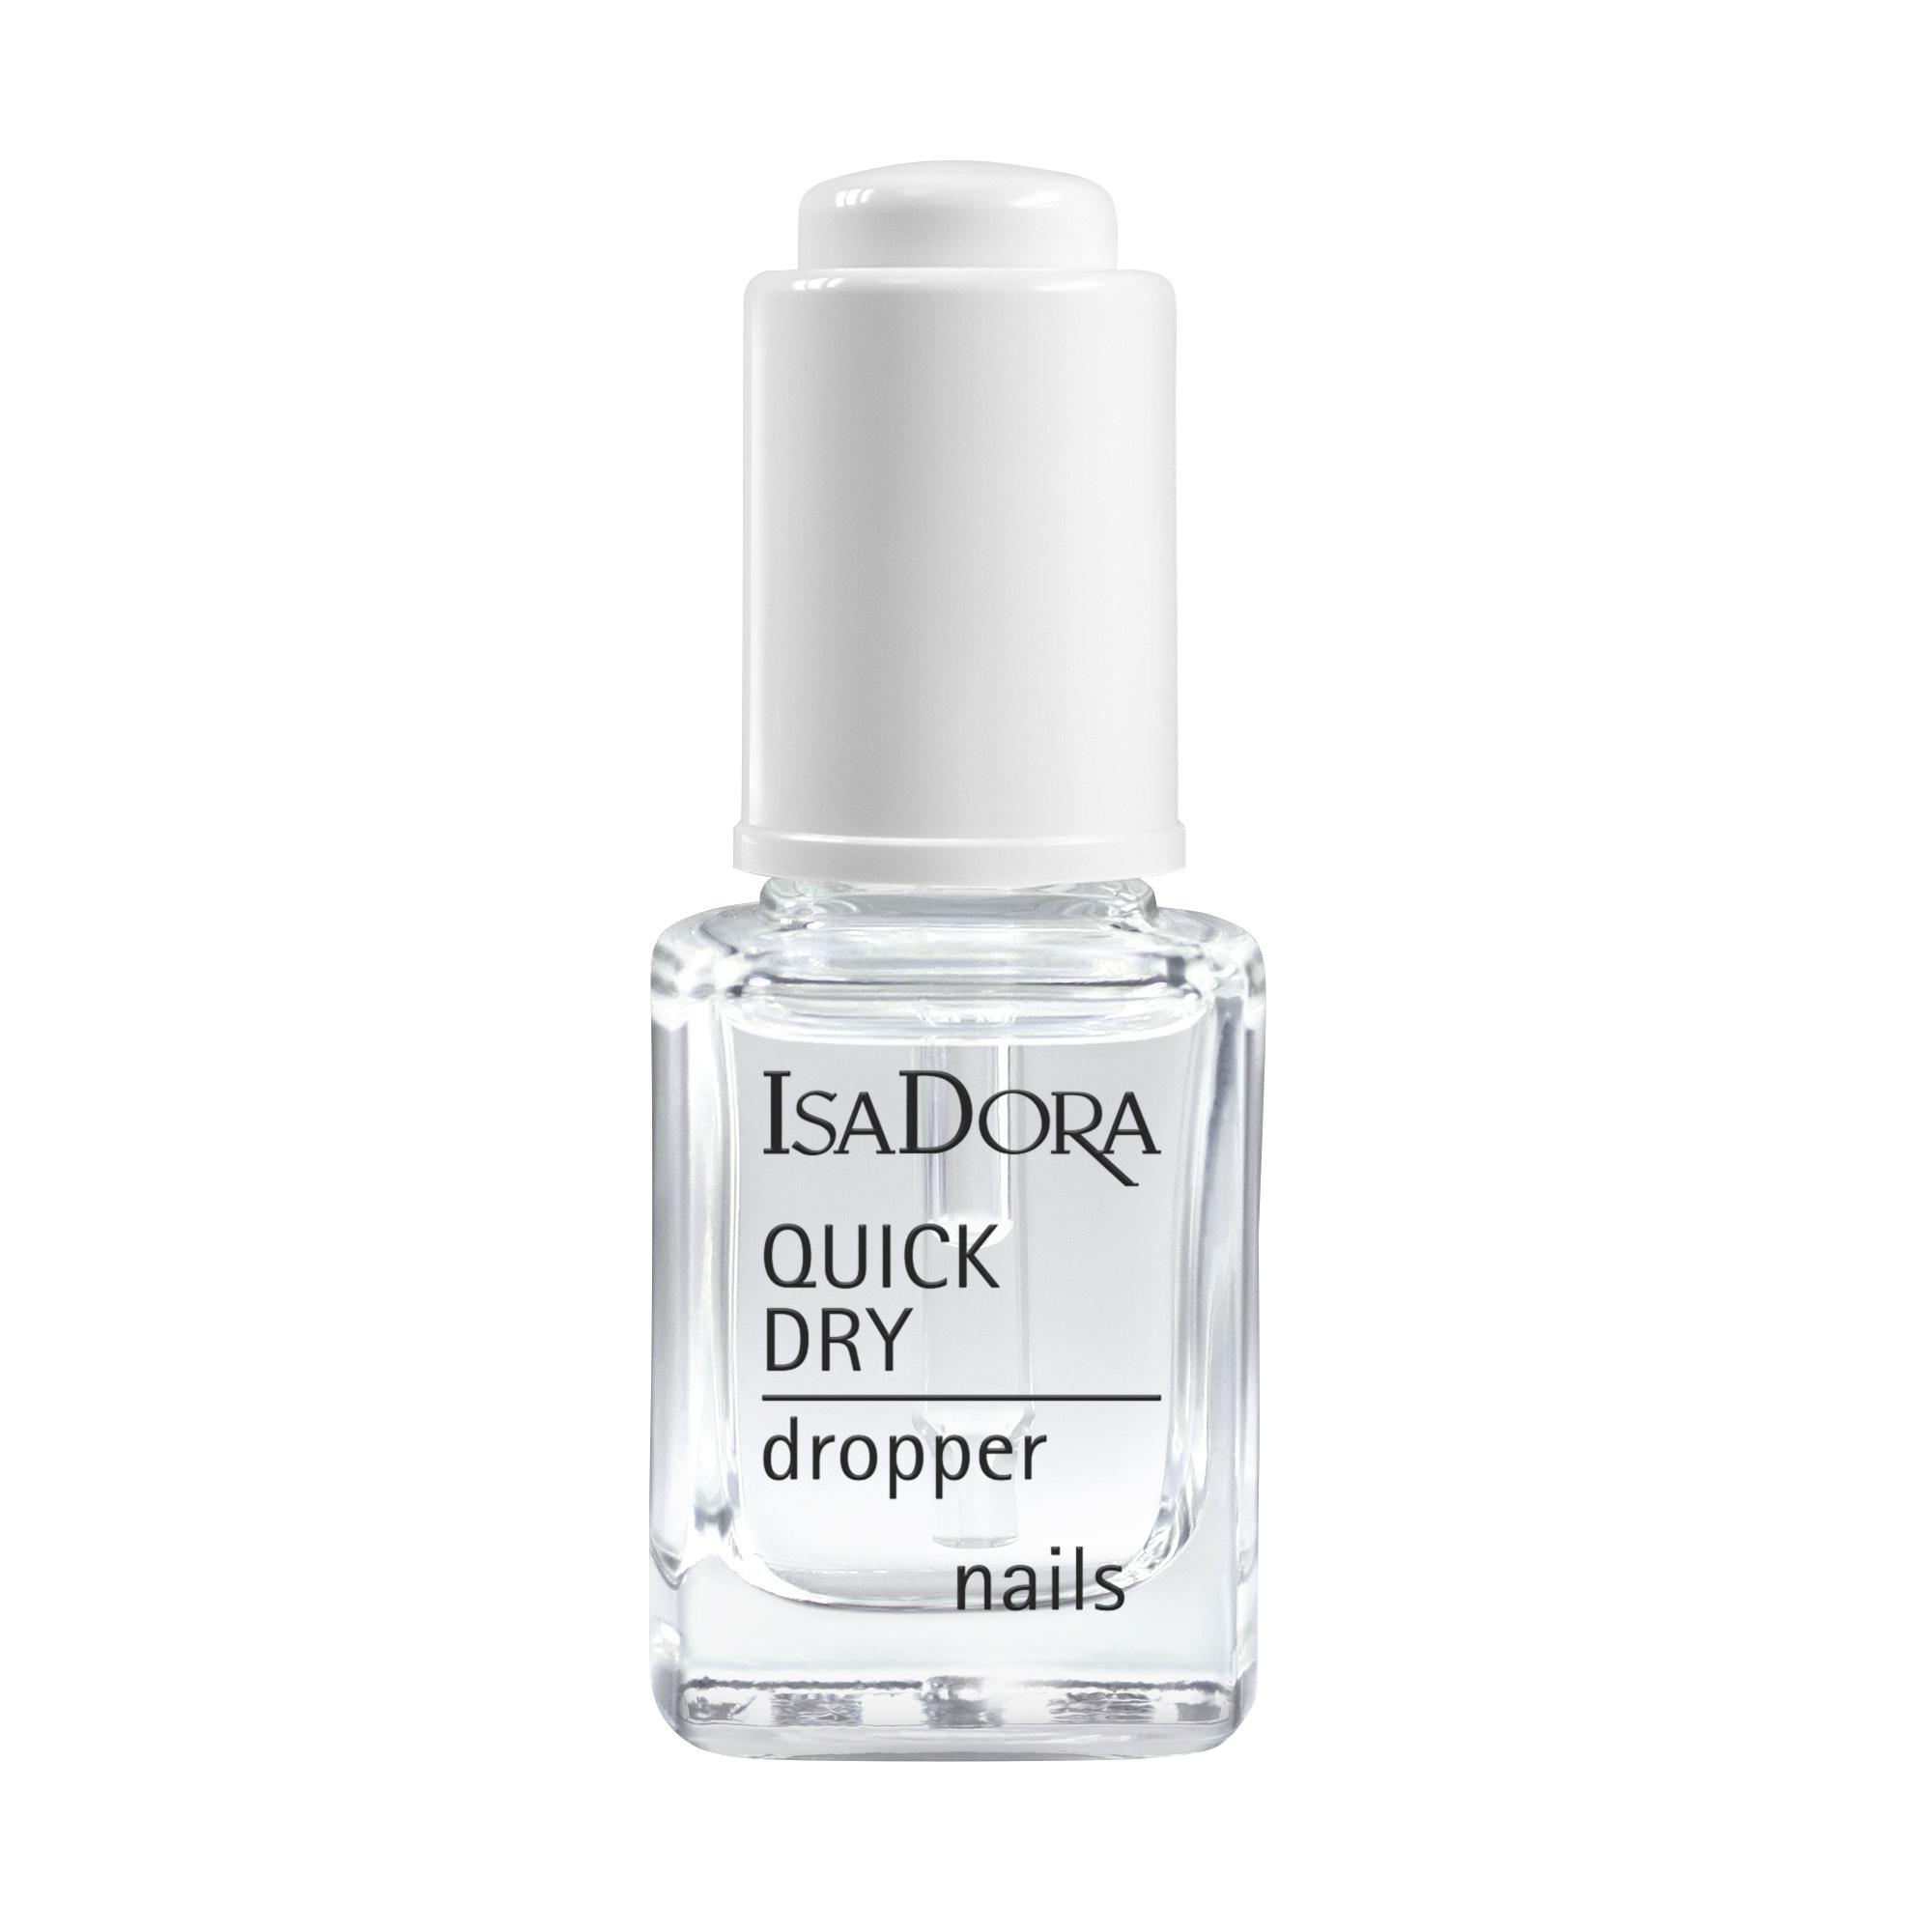 Quick Dry Dropper 691 Quick Dry Nail Dropp Products Isadora En